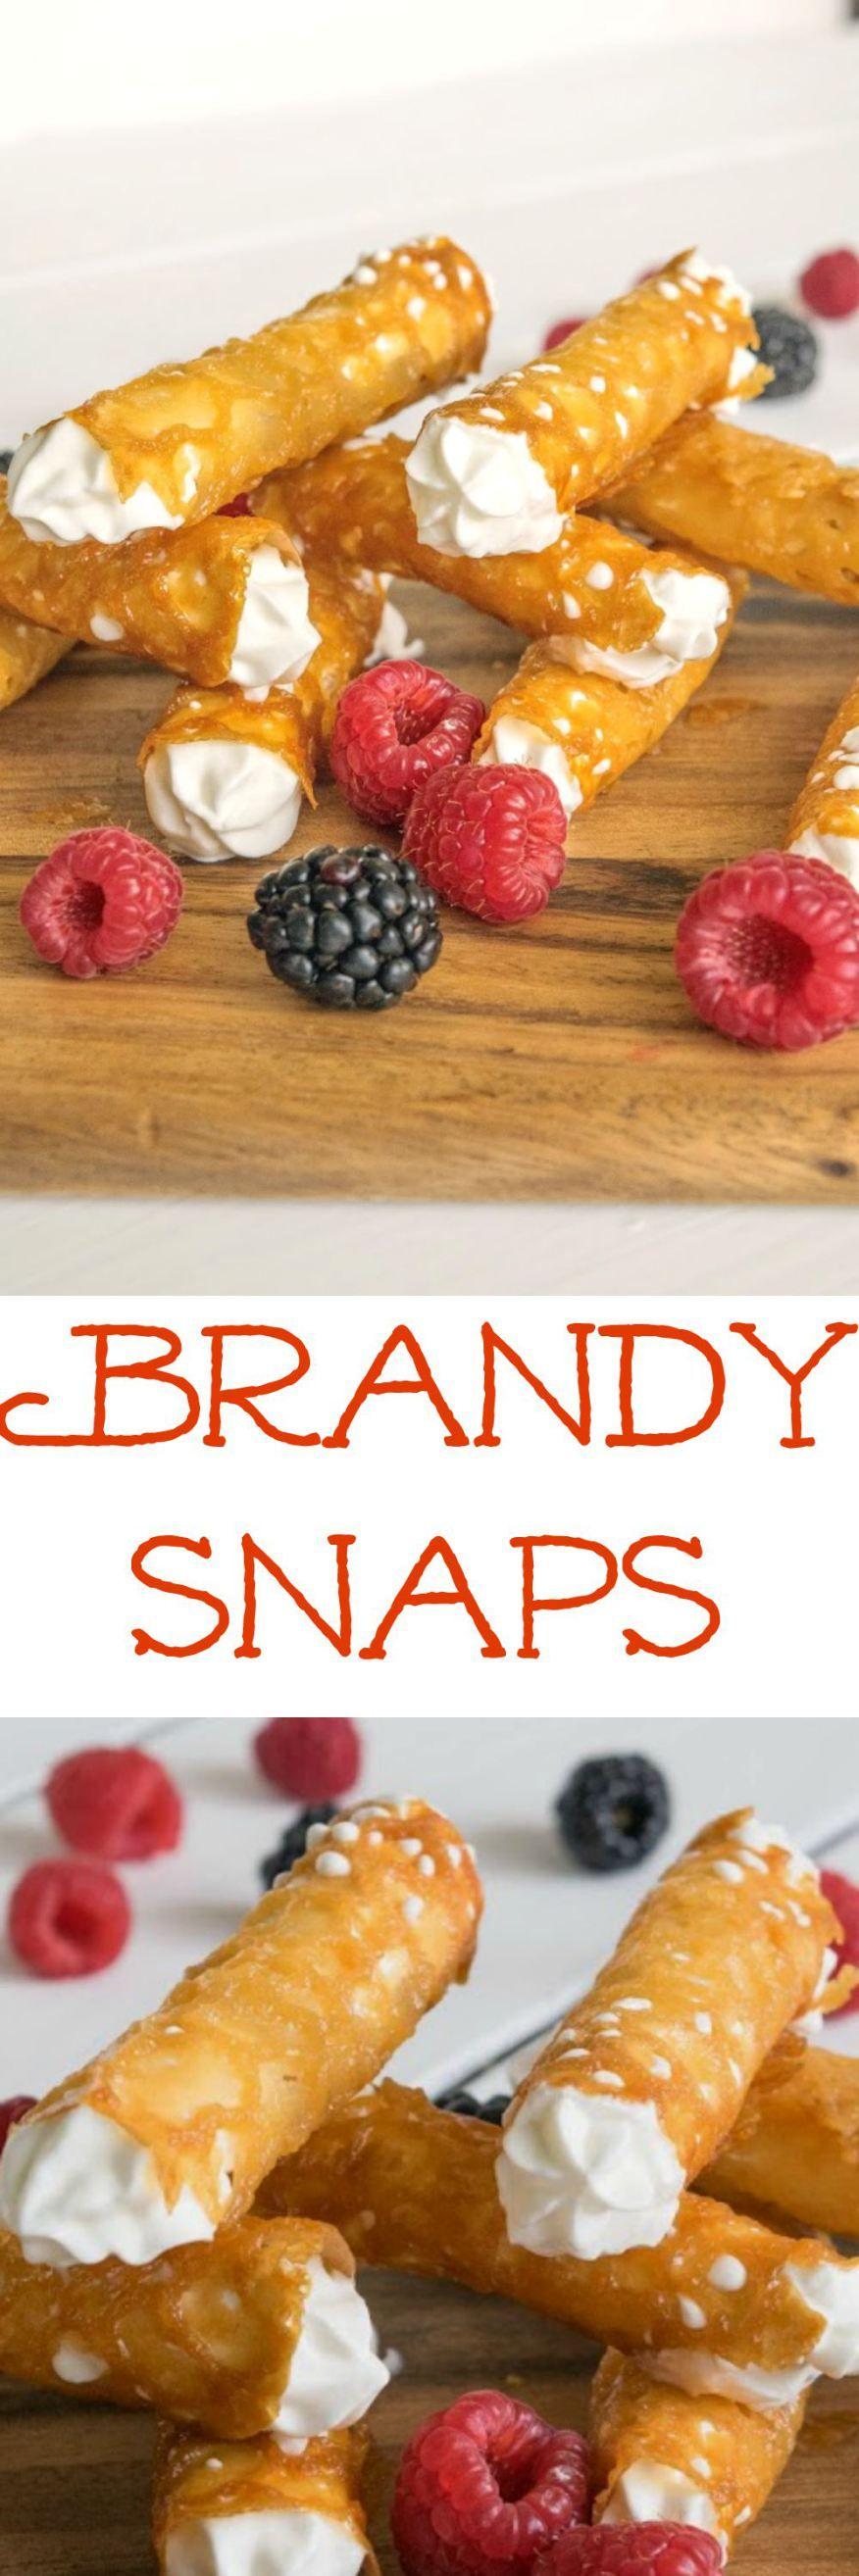 Brandy Snaps Recipe Brandy snaps, British desserts, Food